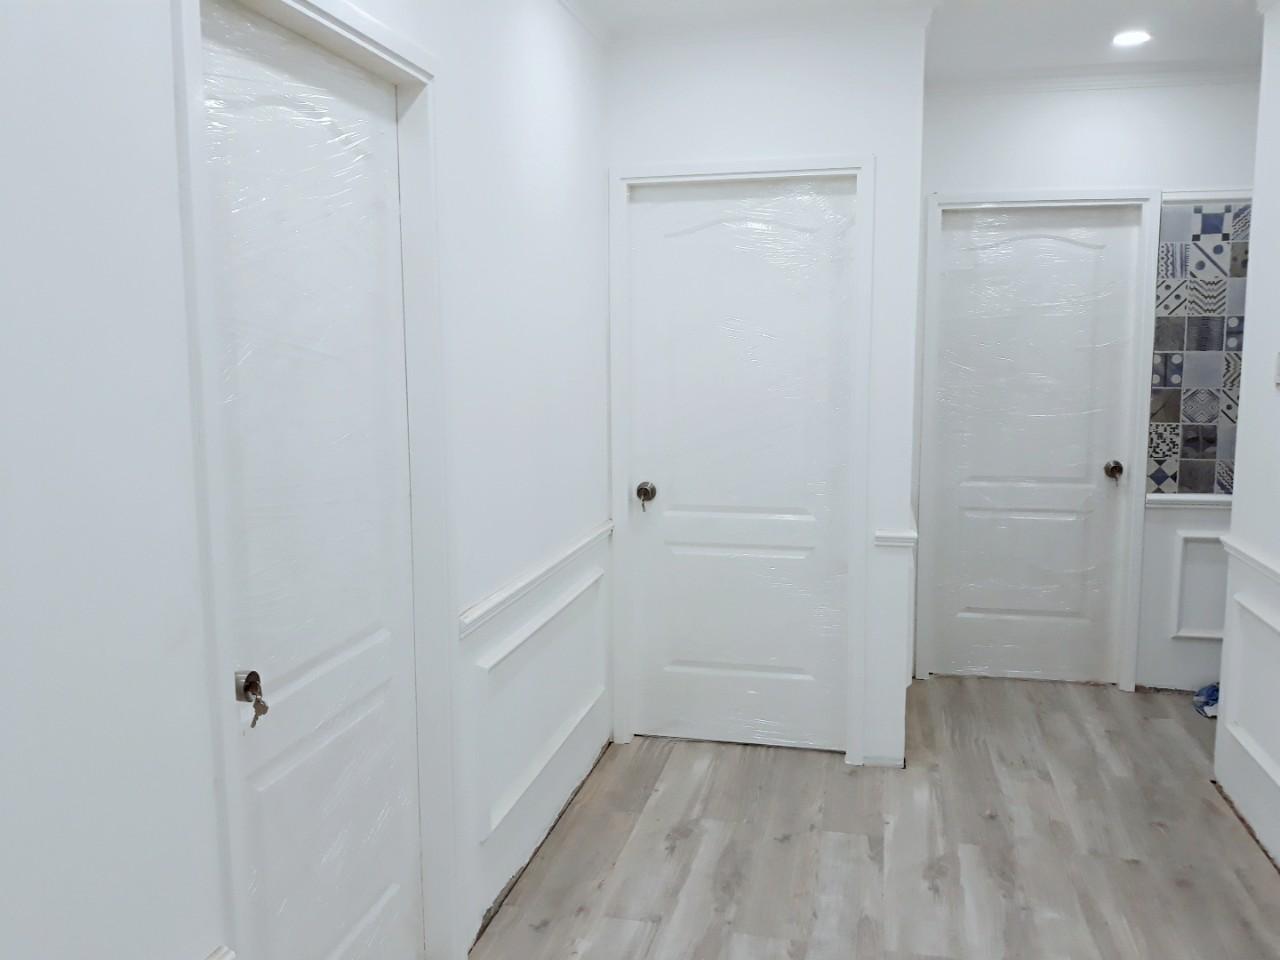 Mẫu cửa nhựa composite sơn PU trắng